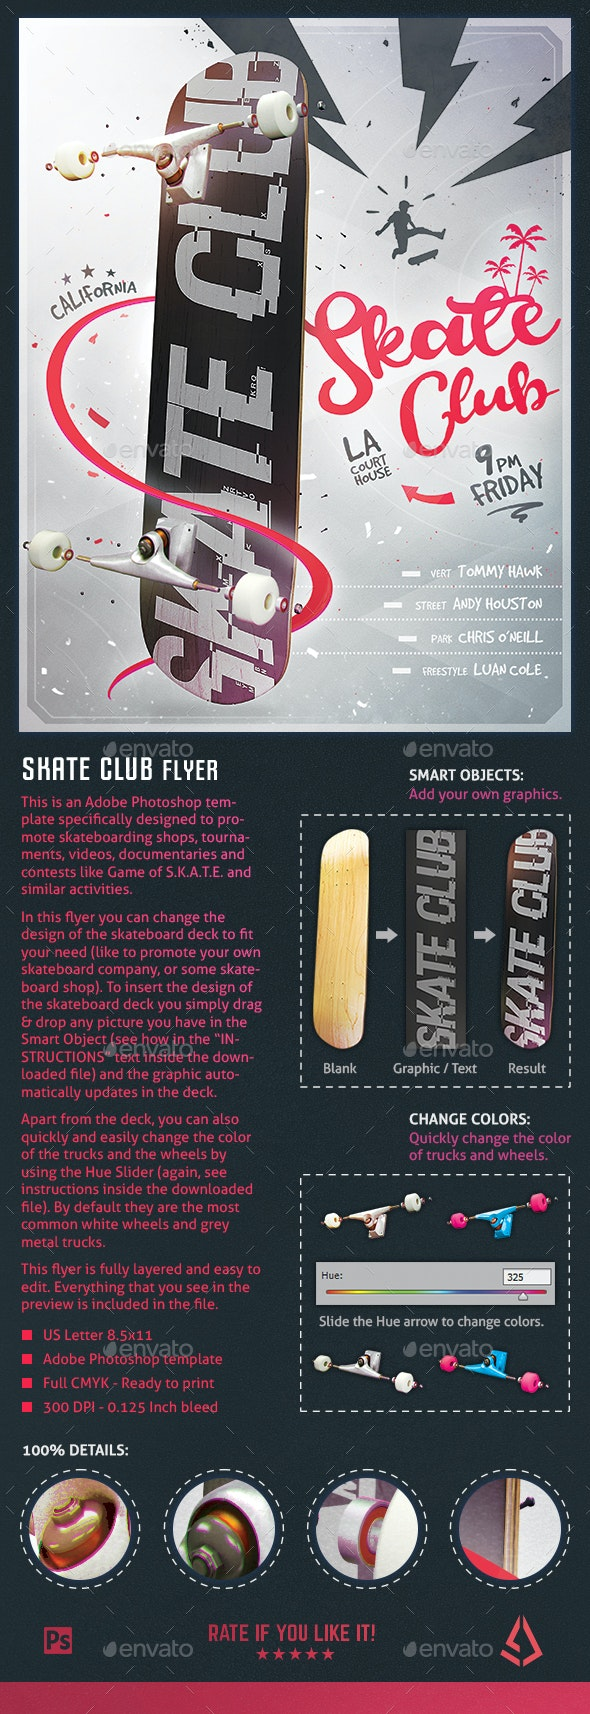 Skate Club Flyer - Skateboard Mockup Poster Template - Sports Events